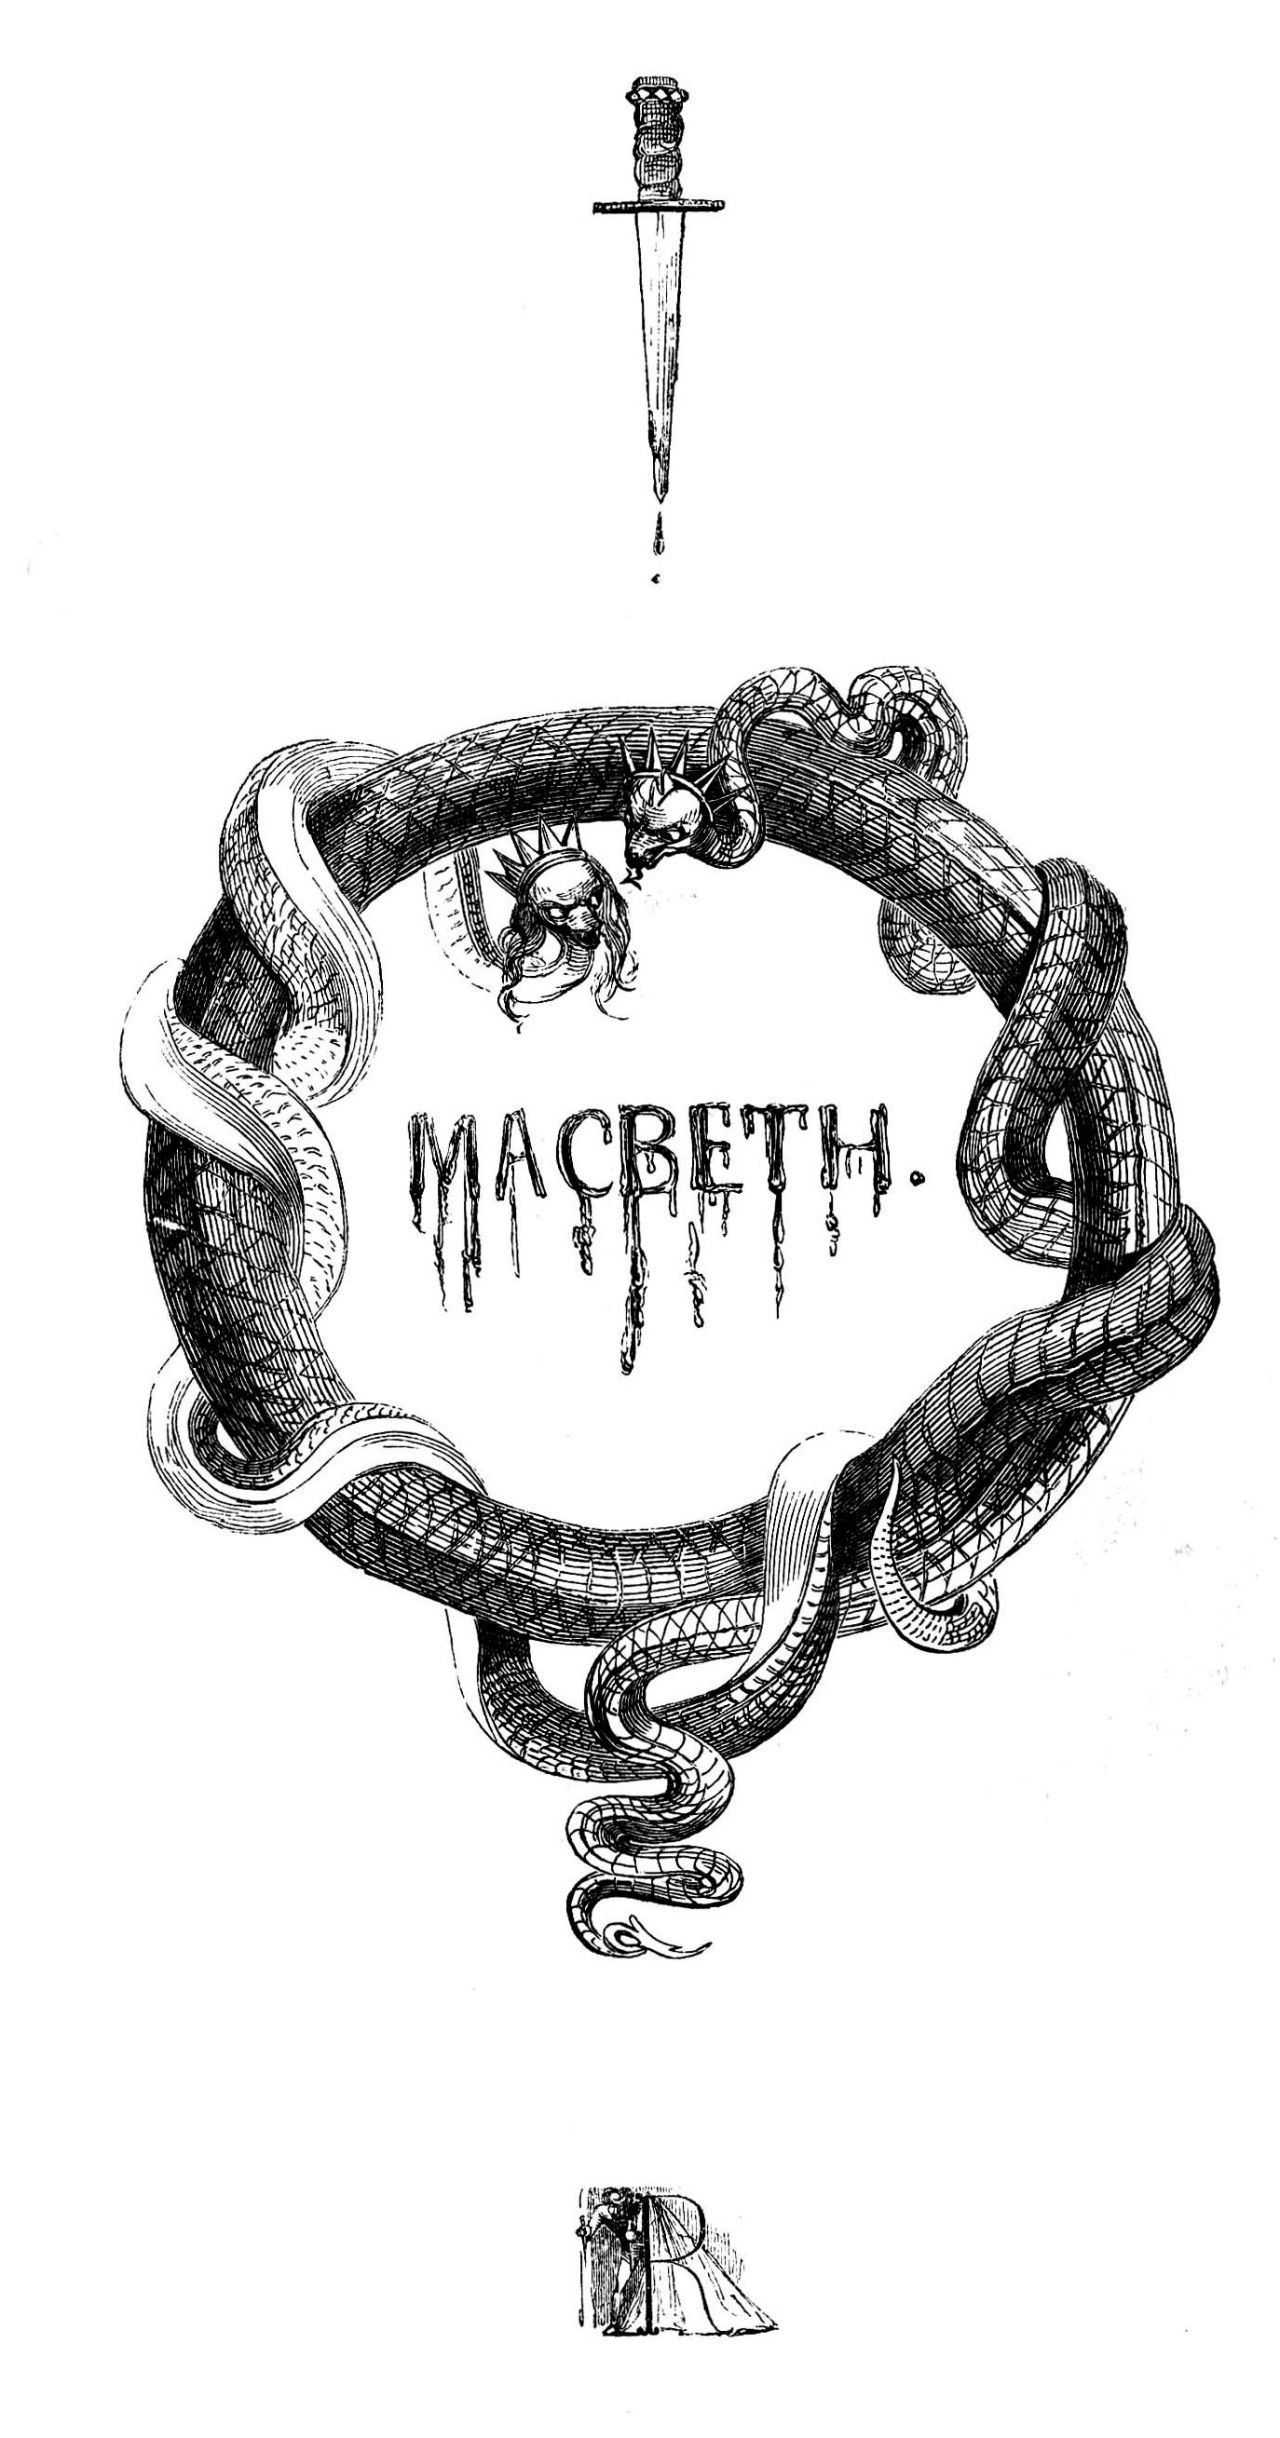 macbeth title page